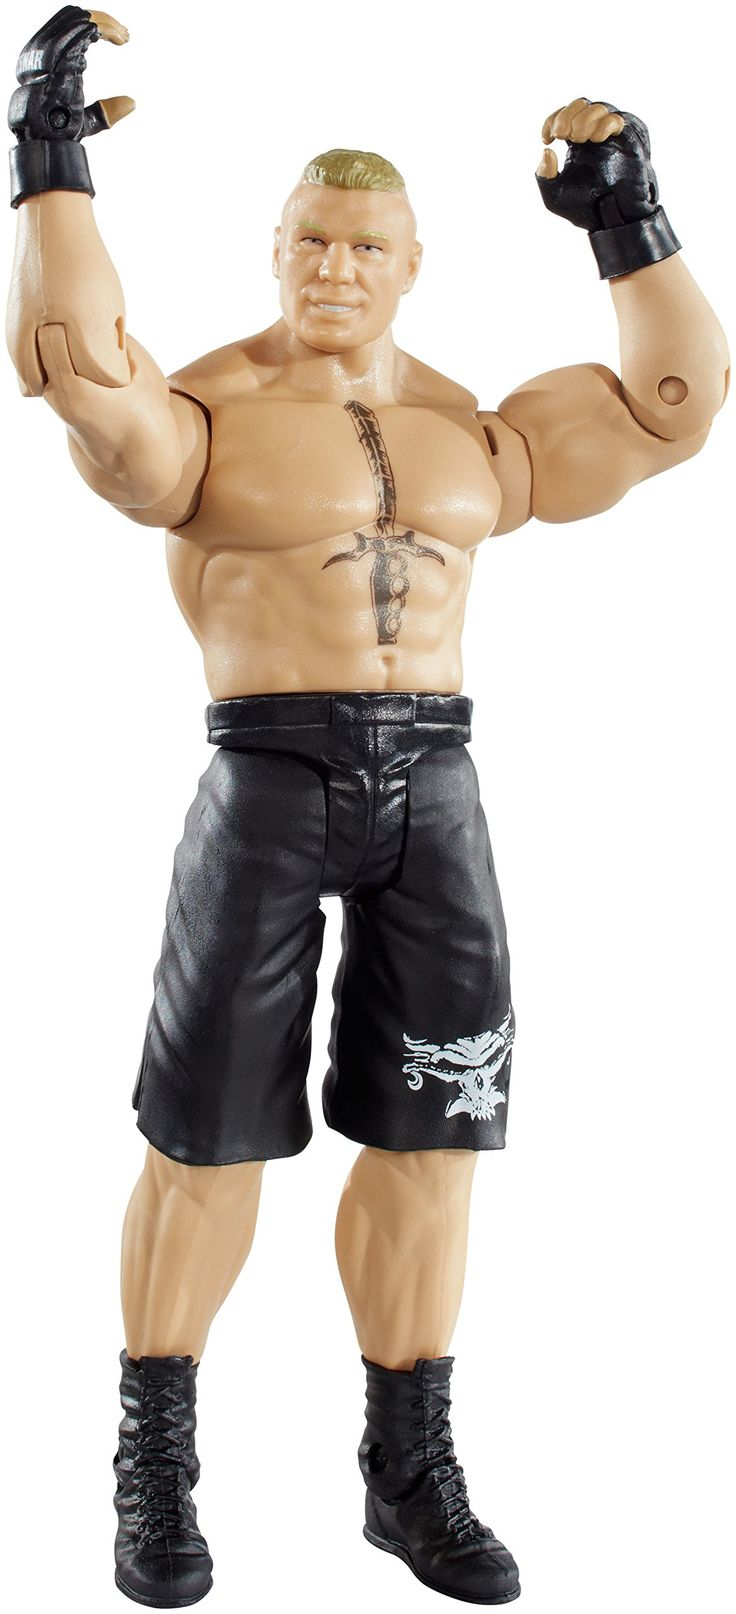 WWE Figure Series #47 -Superstar #15 Brock Lesnar